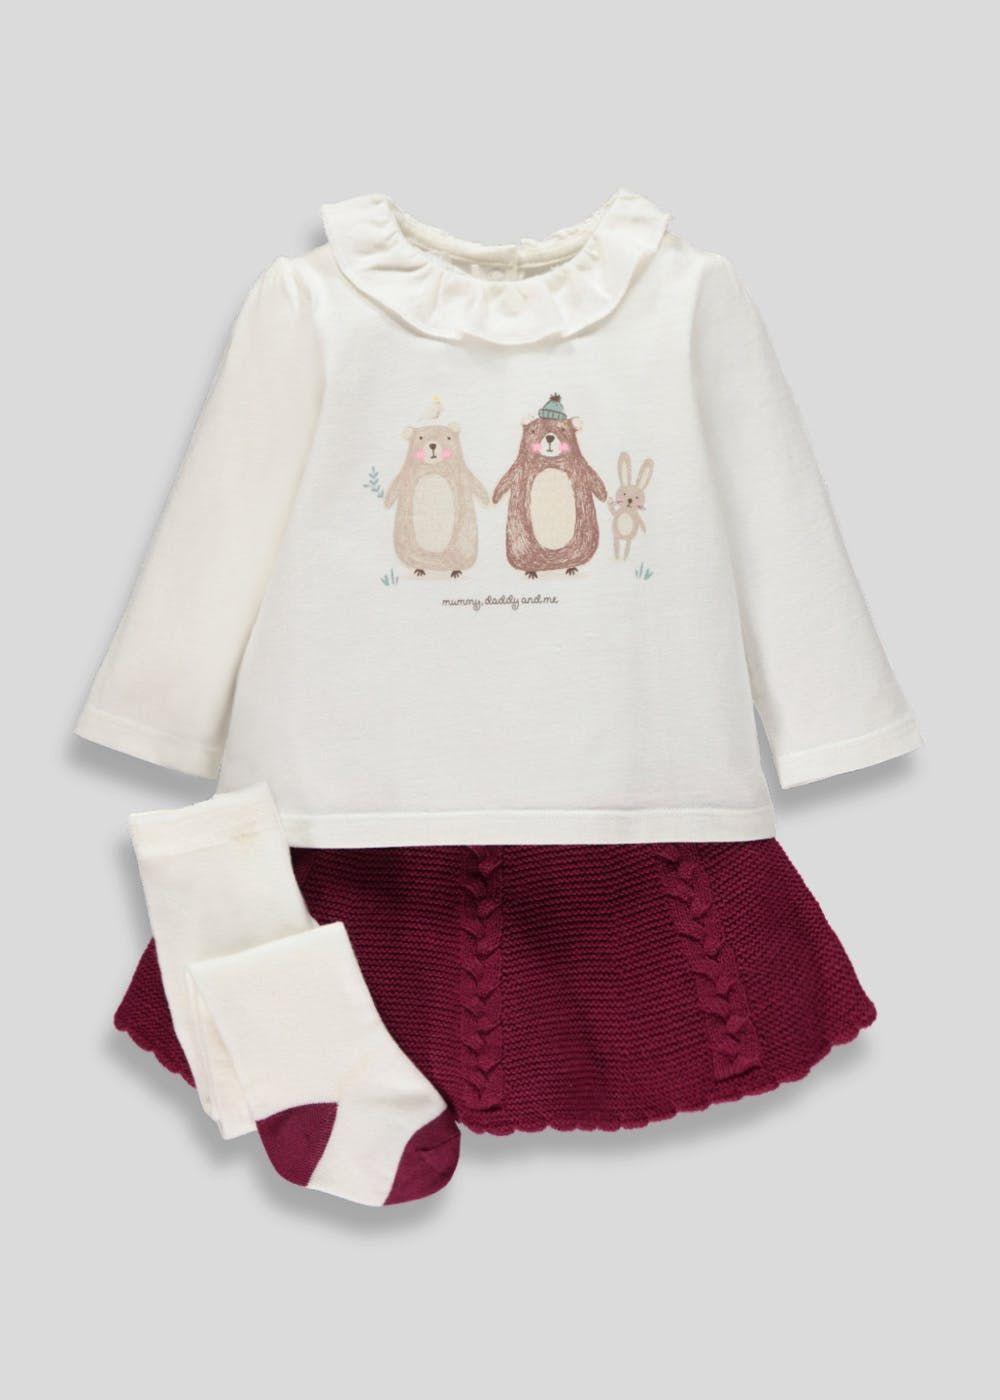 3770e82a13dcb Girls Top, Skirt & Tights Set (Newborn-18mths) – Cream | Bebe Sophie ...